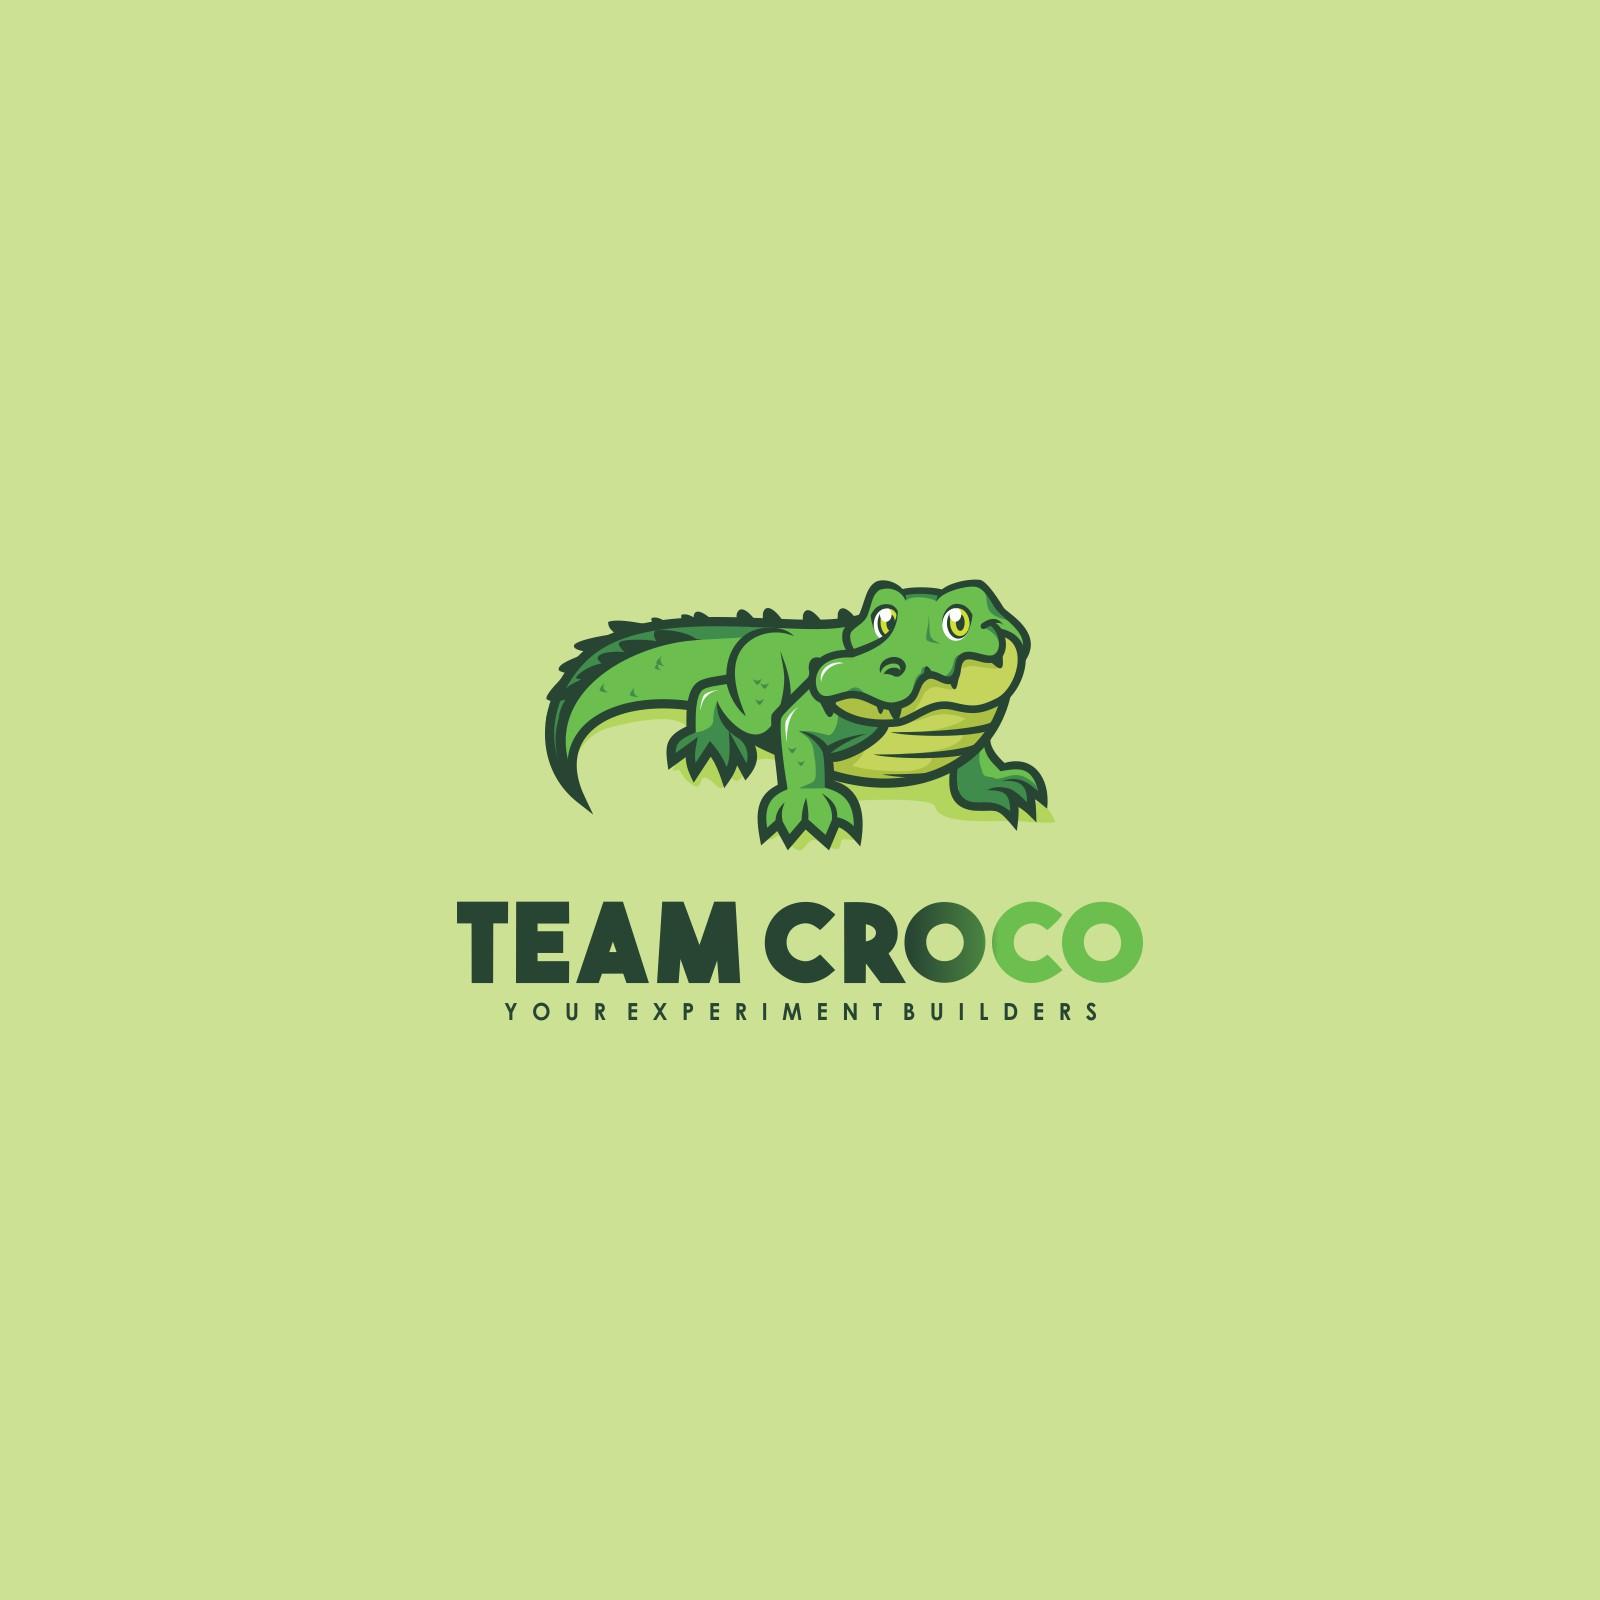 Team Croco needs an awesome logo